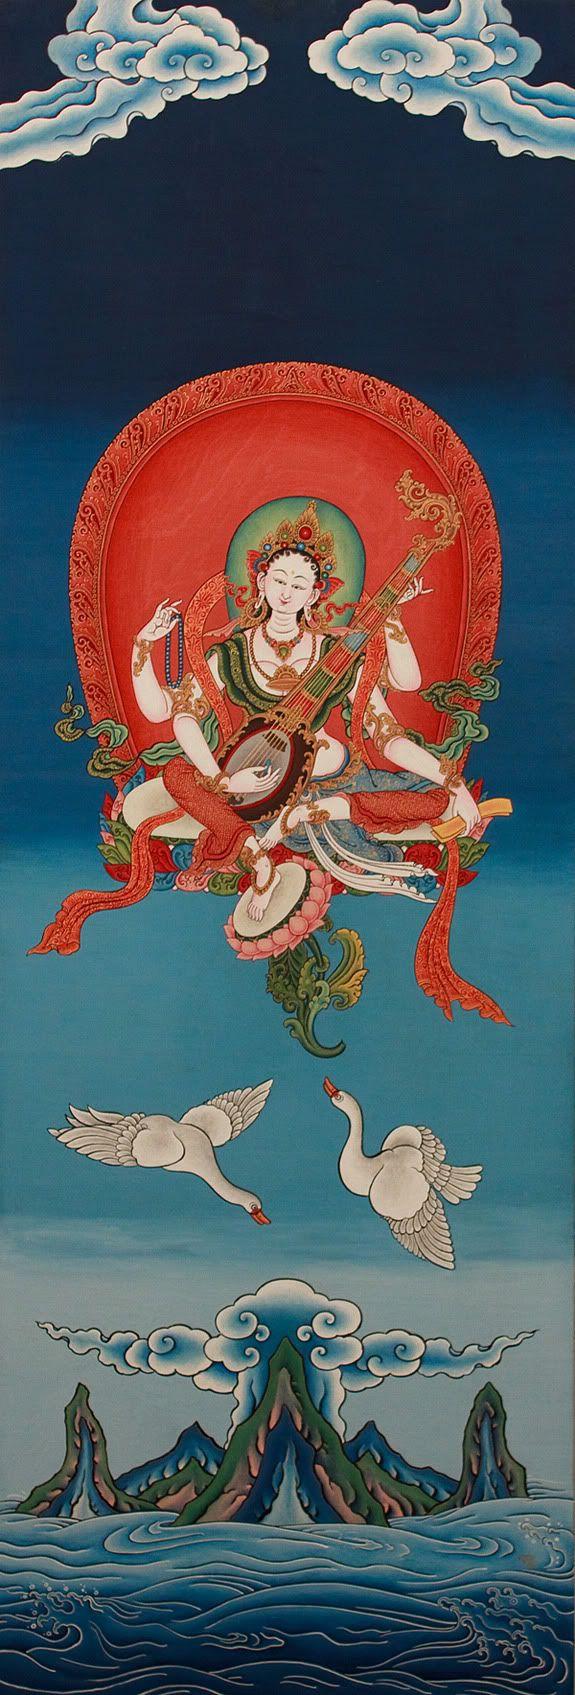 #Sarasvati #tibetan #thangka